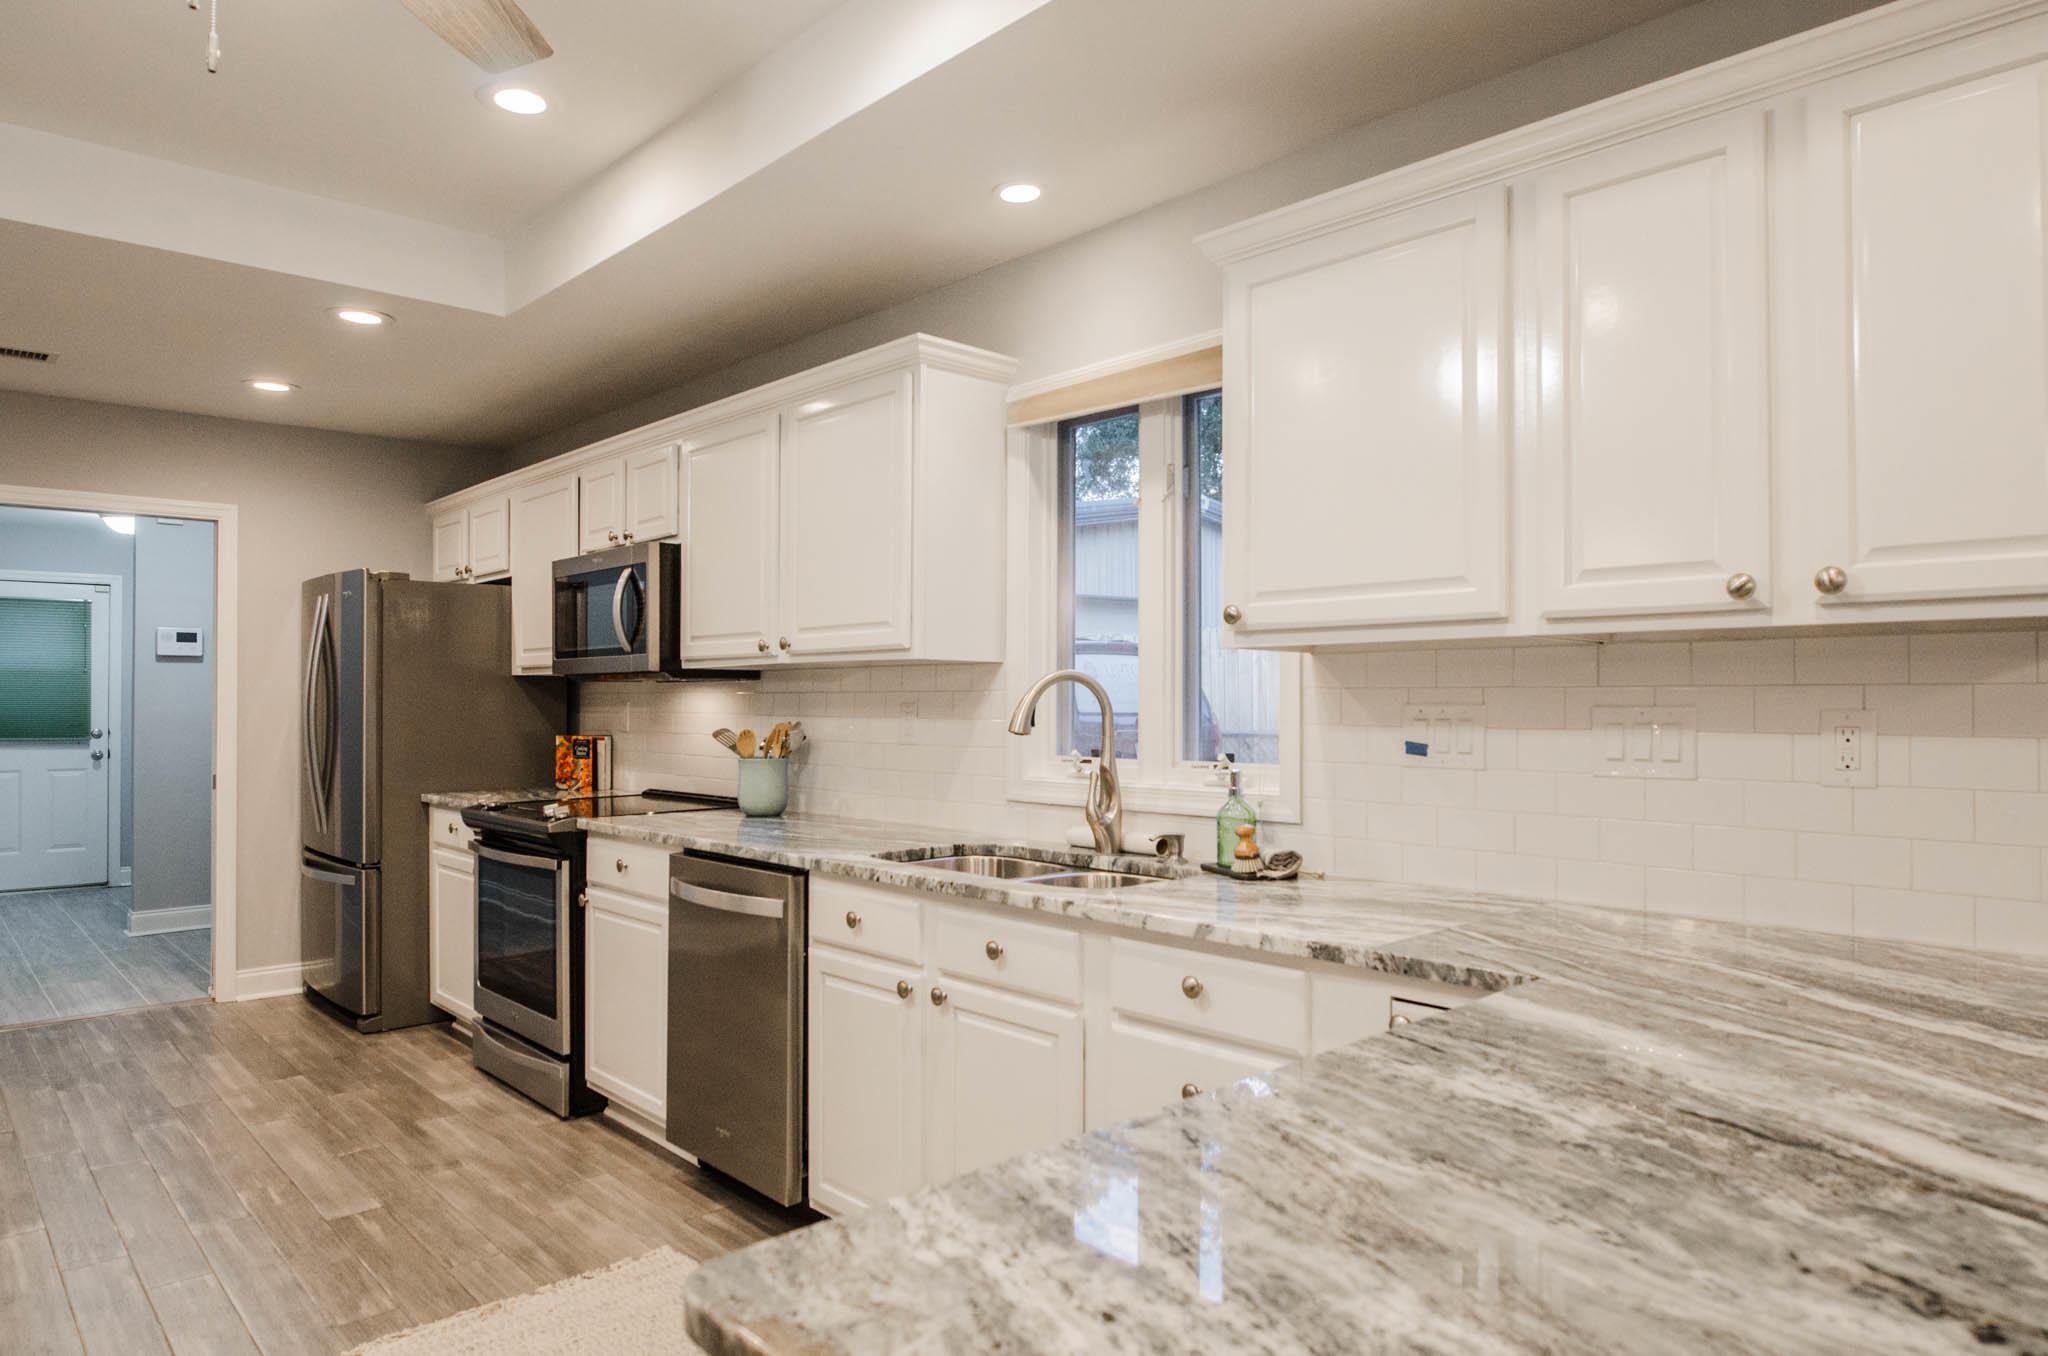 Covington Hills Homes For Sale - 5886 Ryans Bluff, North Charleston, SC - 10